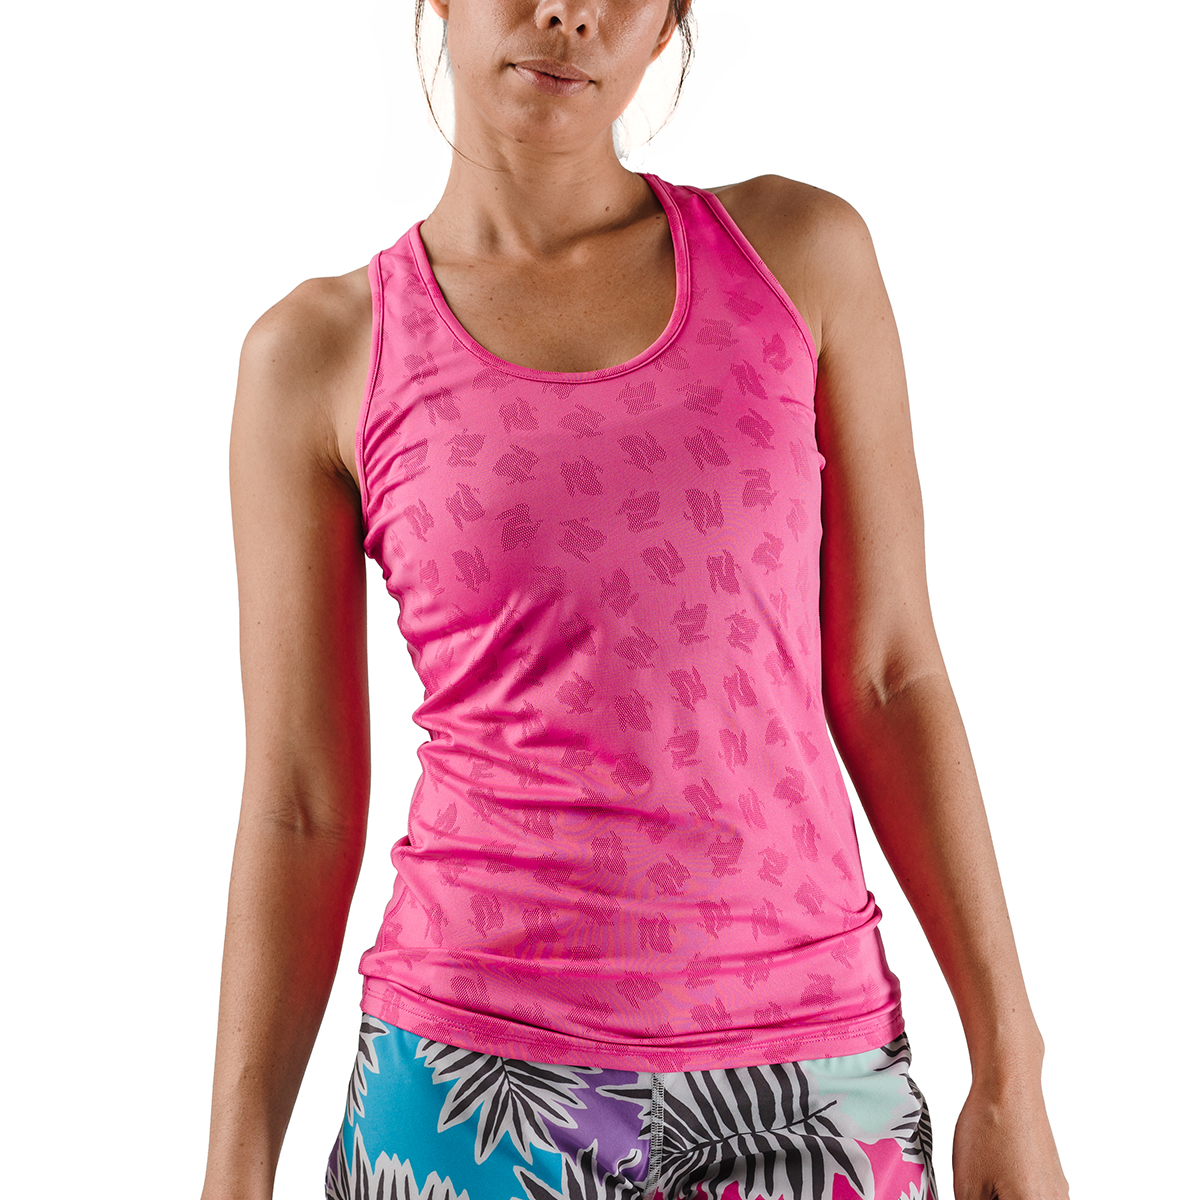 Women's Rabbit Bunny Hop Tank - Color: Ibis Rose - Size: XS, Ibis Rose, large, image 1